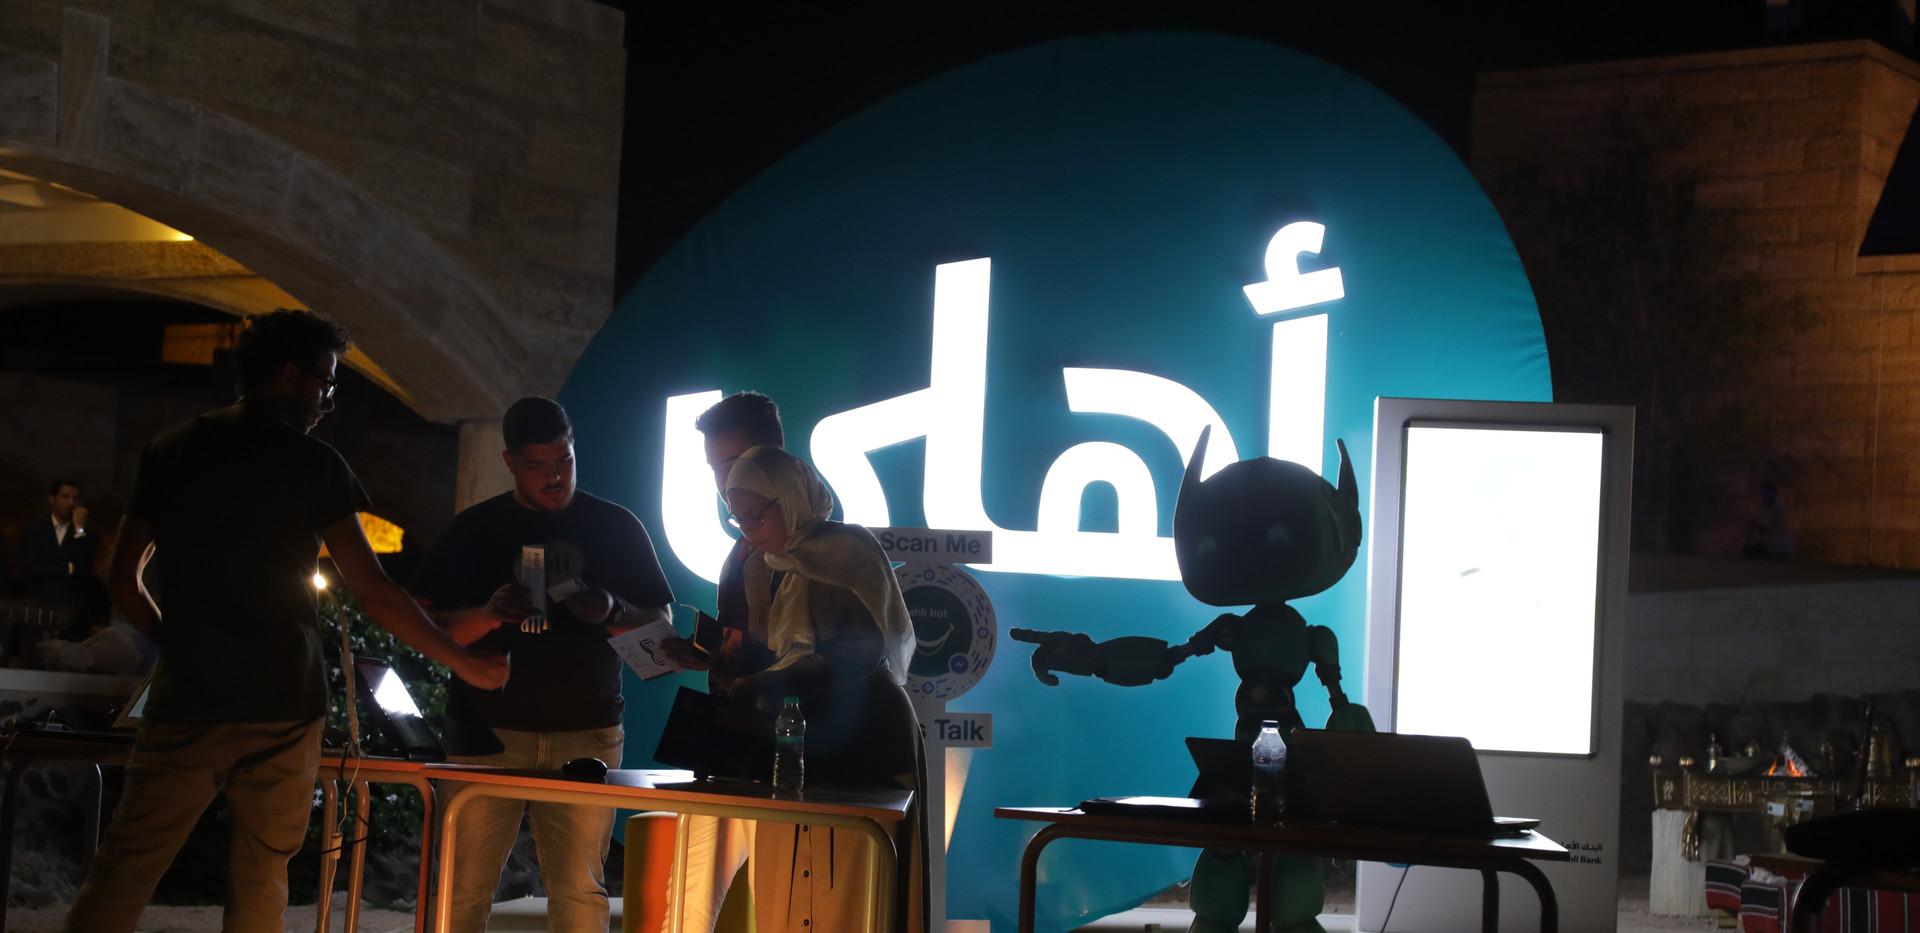 F8 2019 event